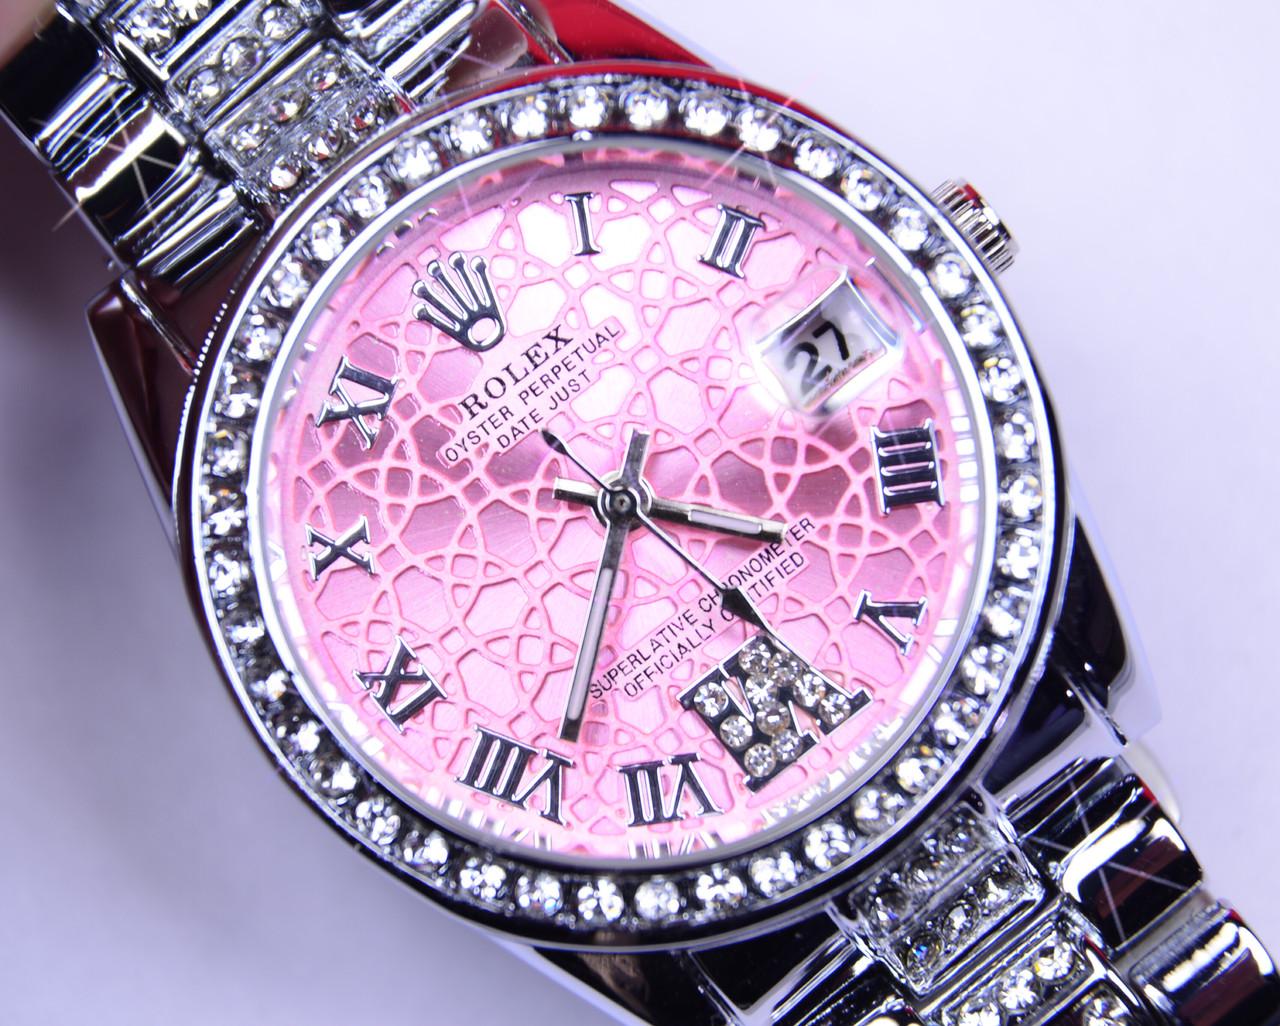 Женские часы Rolex Qyster Perpetual DateJust календарь